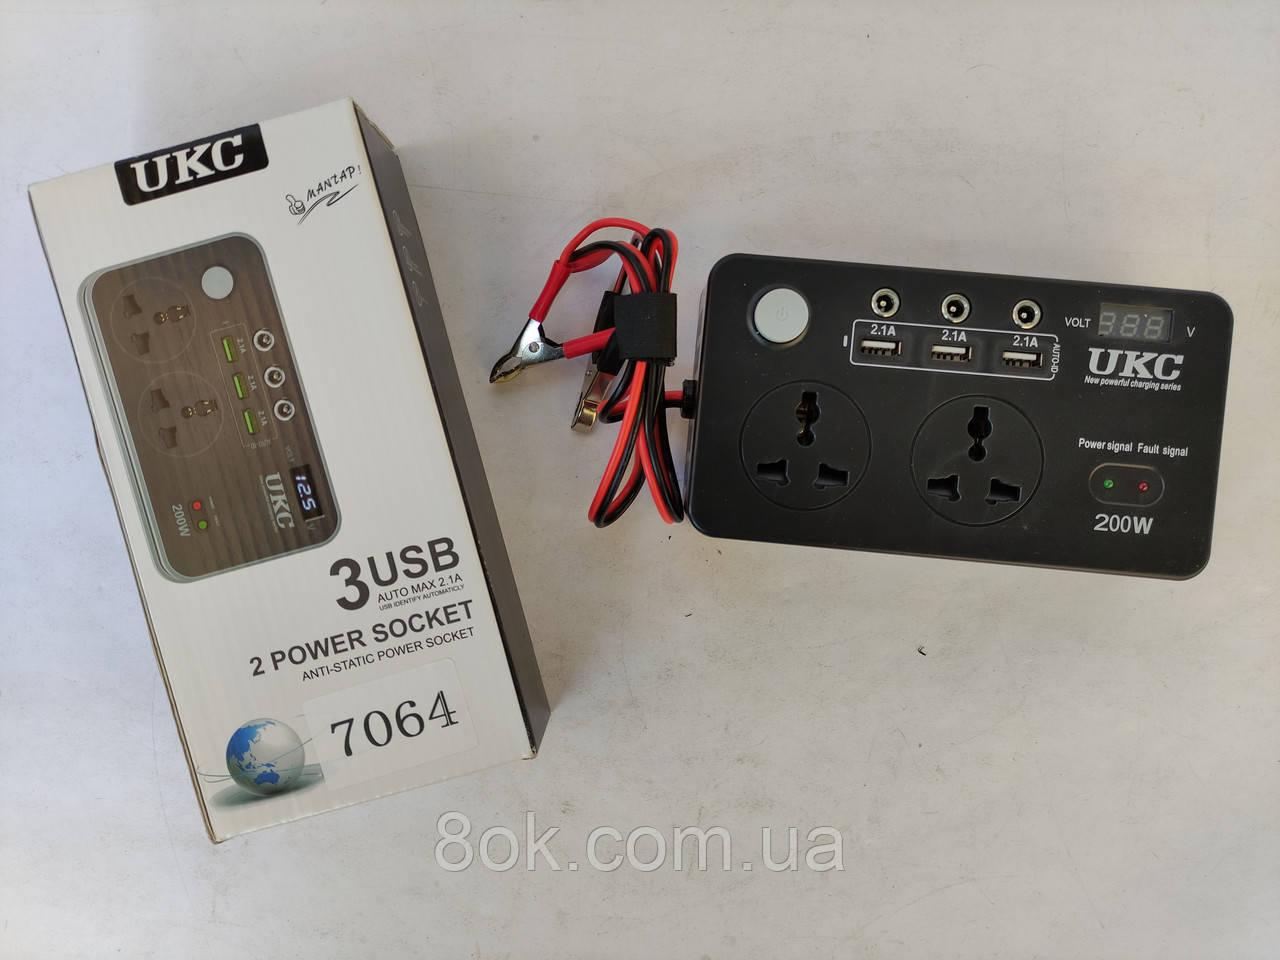 Преобразователь UKC 12-220V 200W с LCD и USB 7064